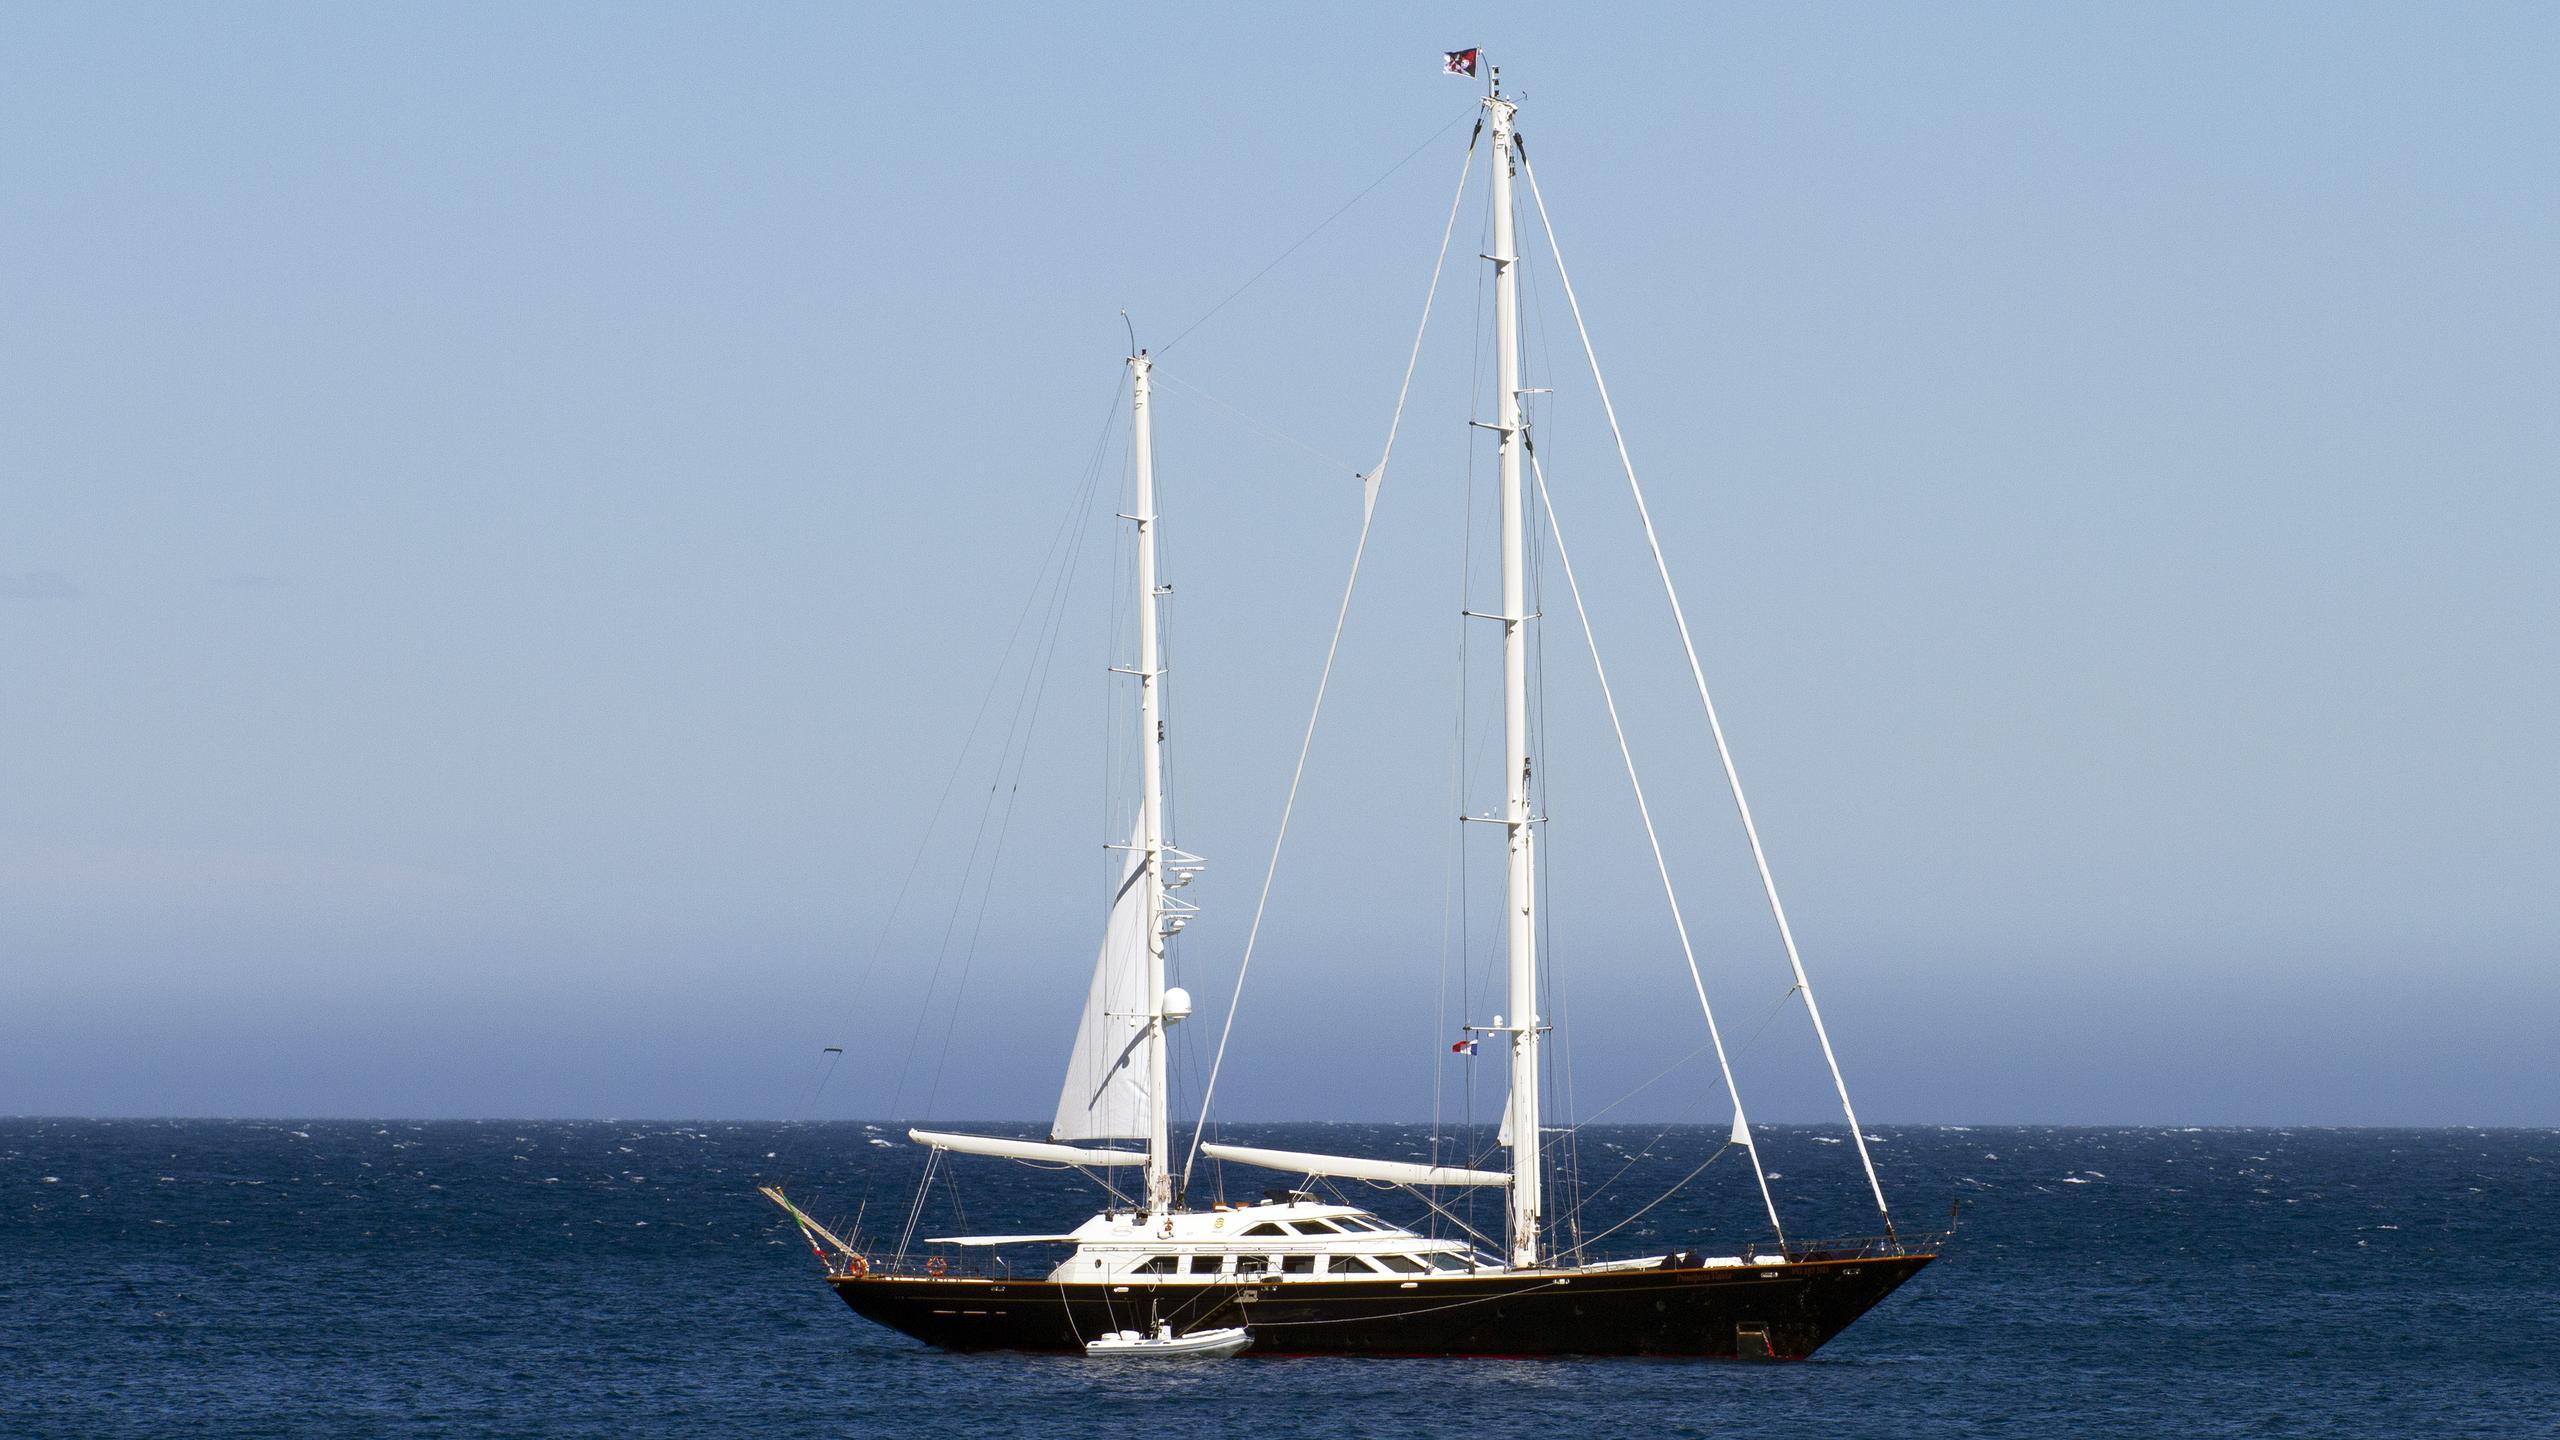 principessa-vaivia-sailing-yacht-perini-navi-1991-40m-profile-with-masts